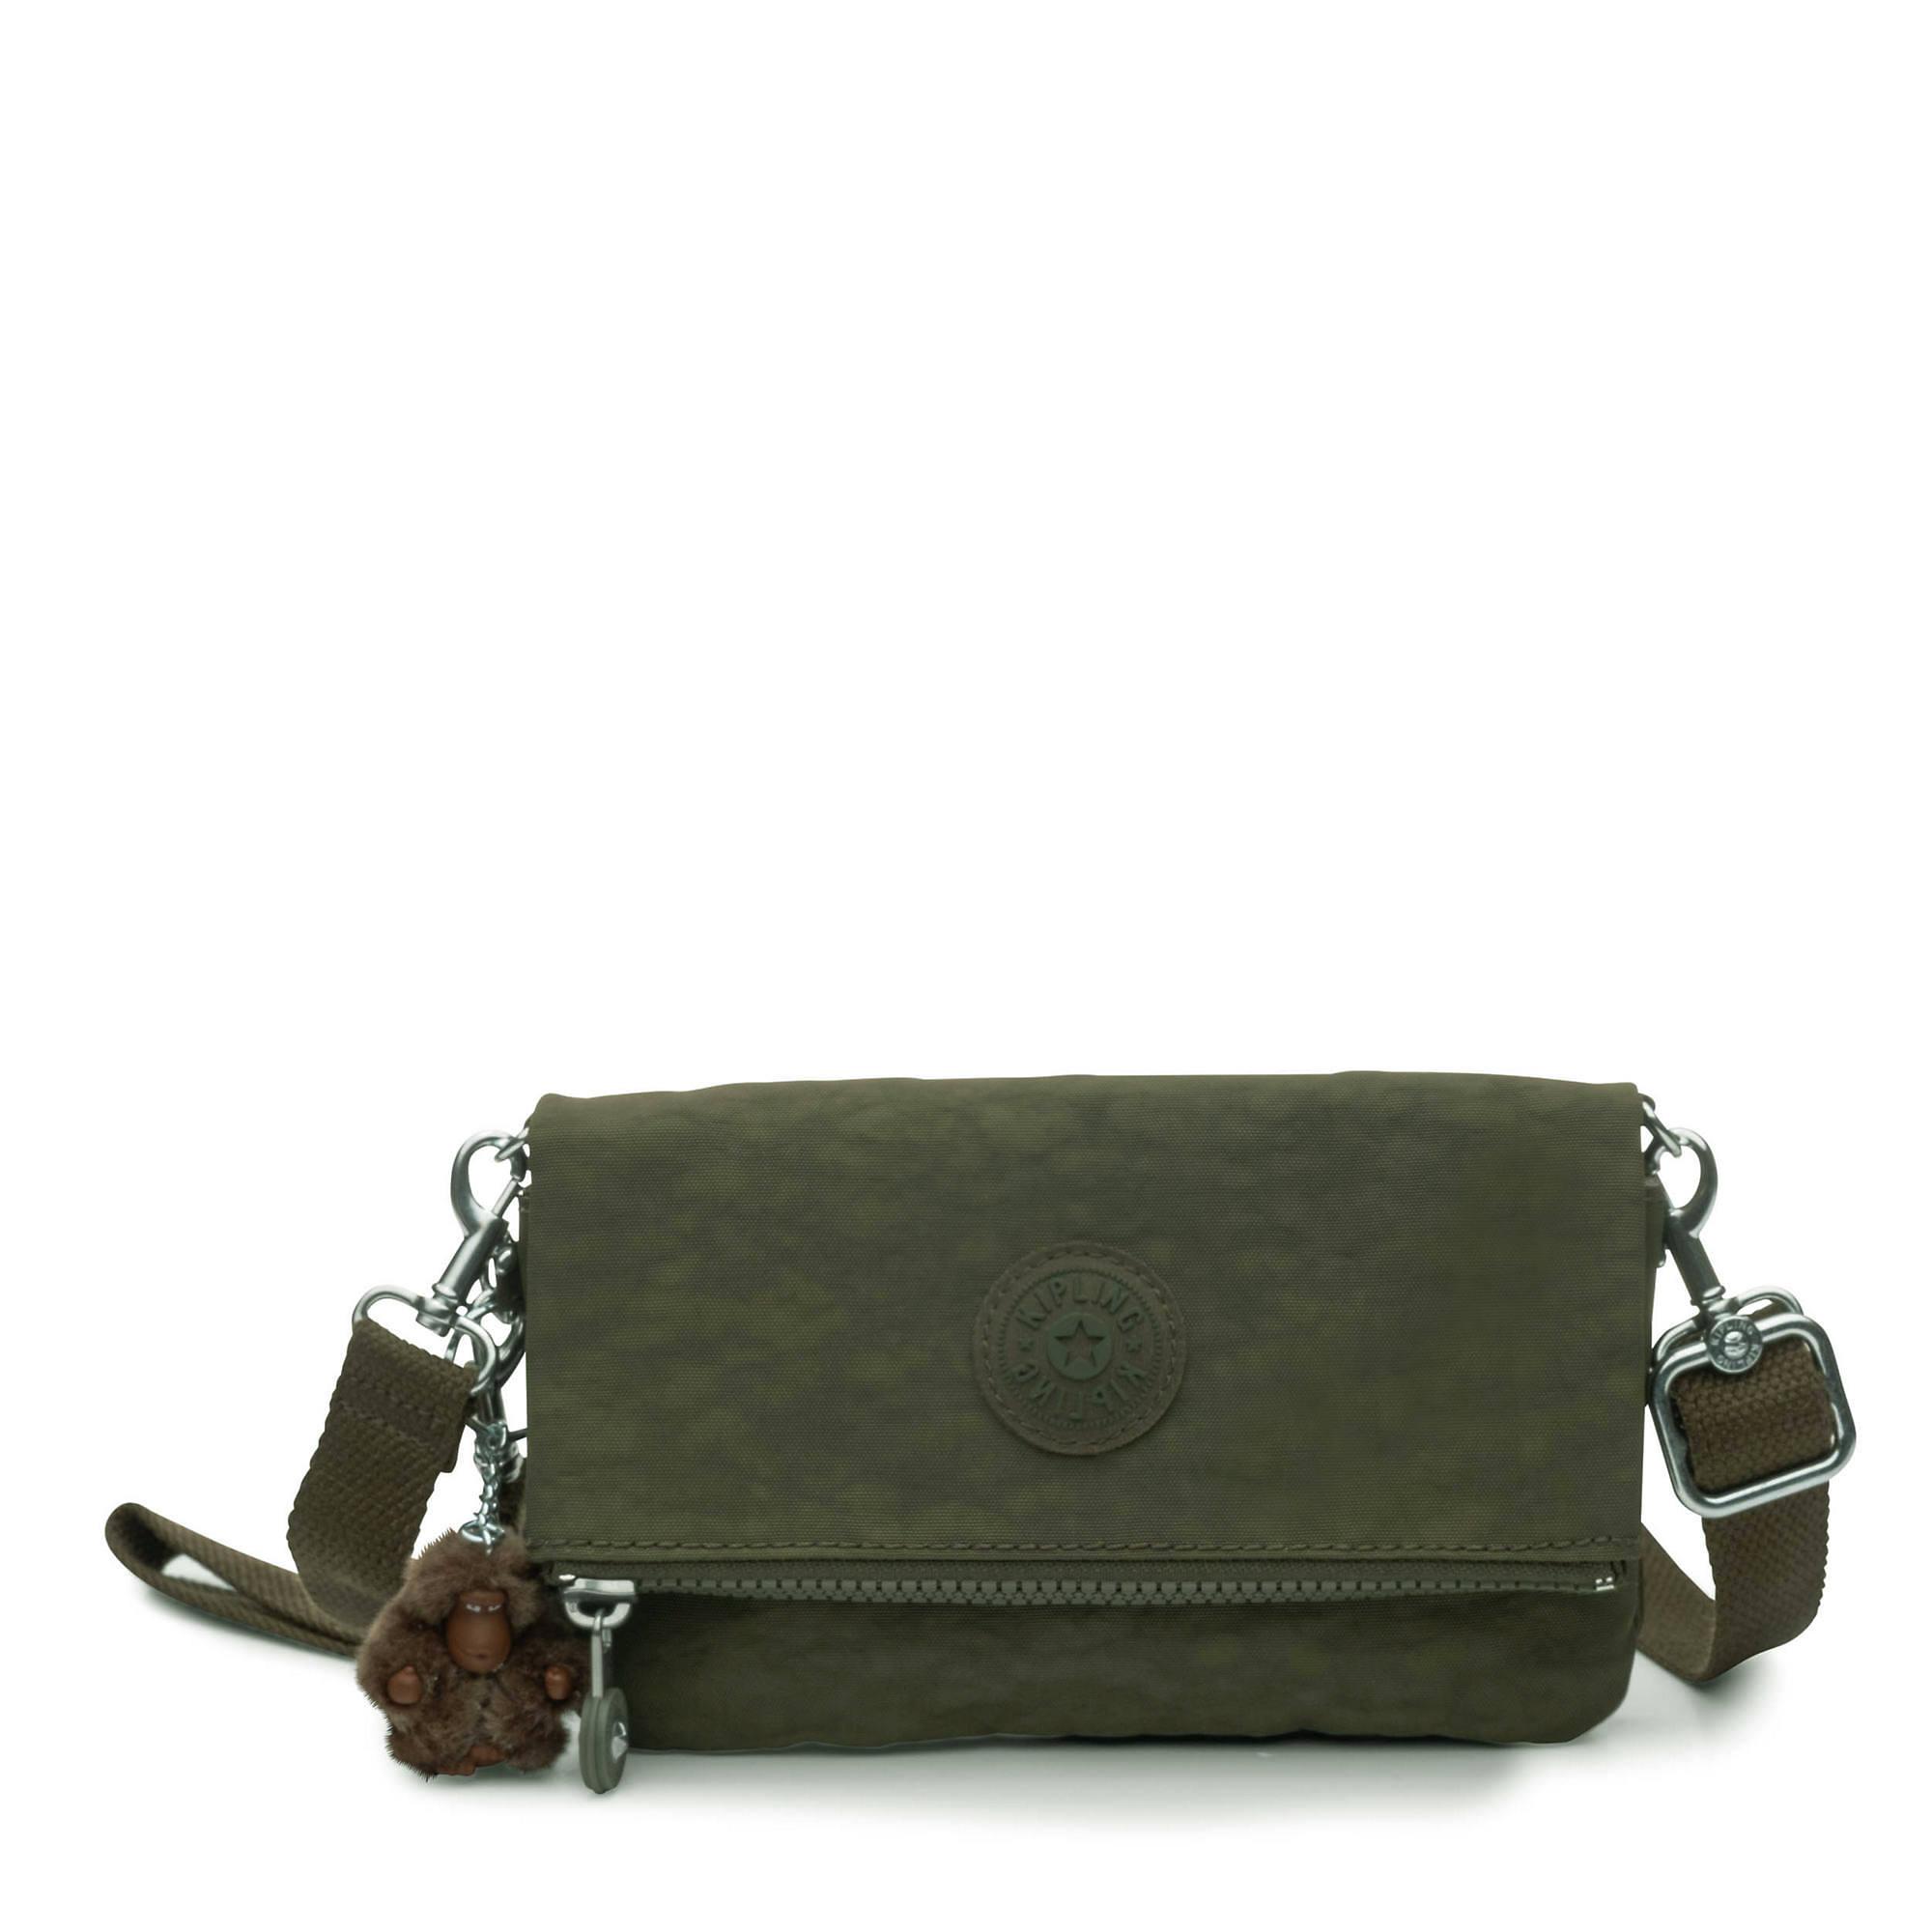 96886112a92f8 Lynne 3-in-1 Convertible Crossbody Bag